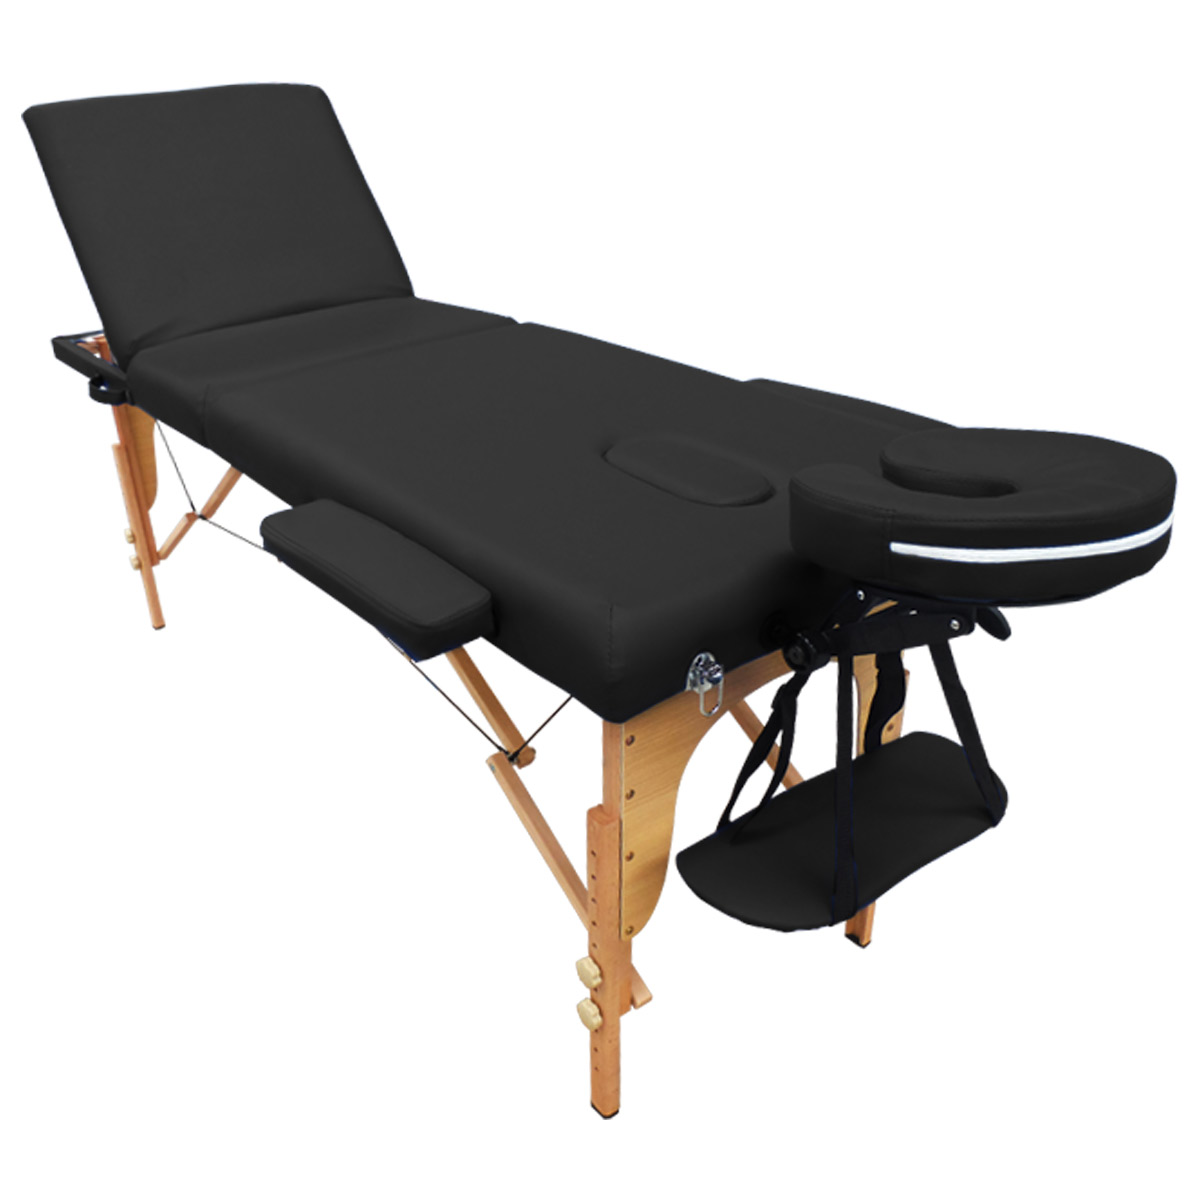 Cama Masaje Spa Estuche Portatil Reclinable Profesional